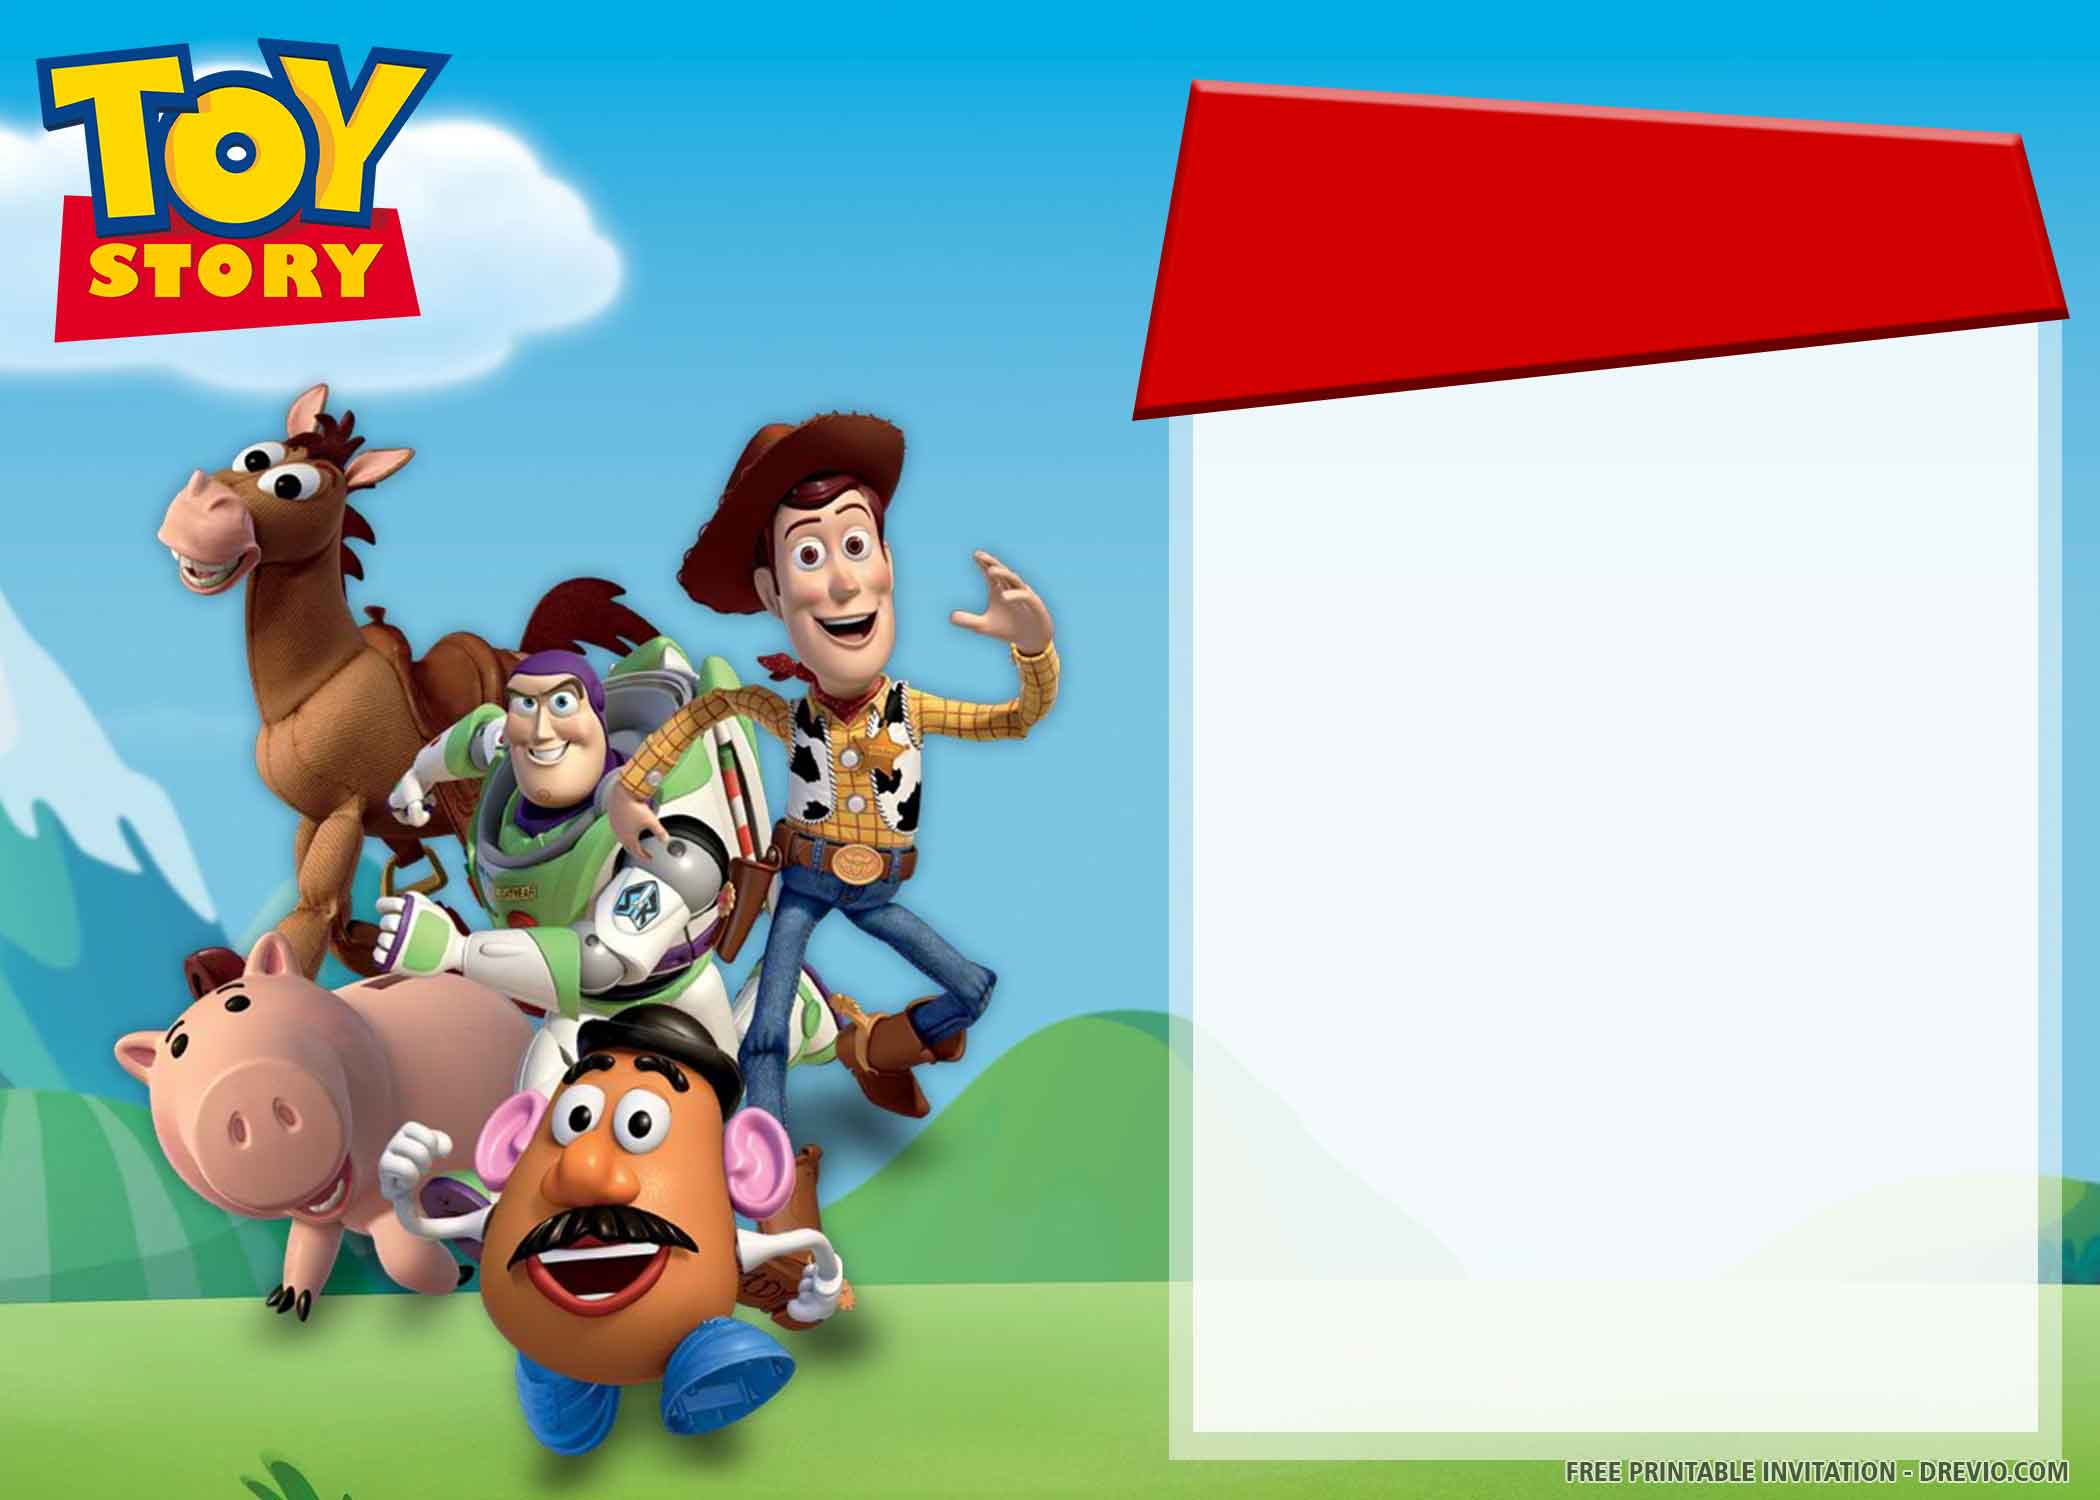 Free Printable Toy Story 3 Birthday Invitation